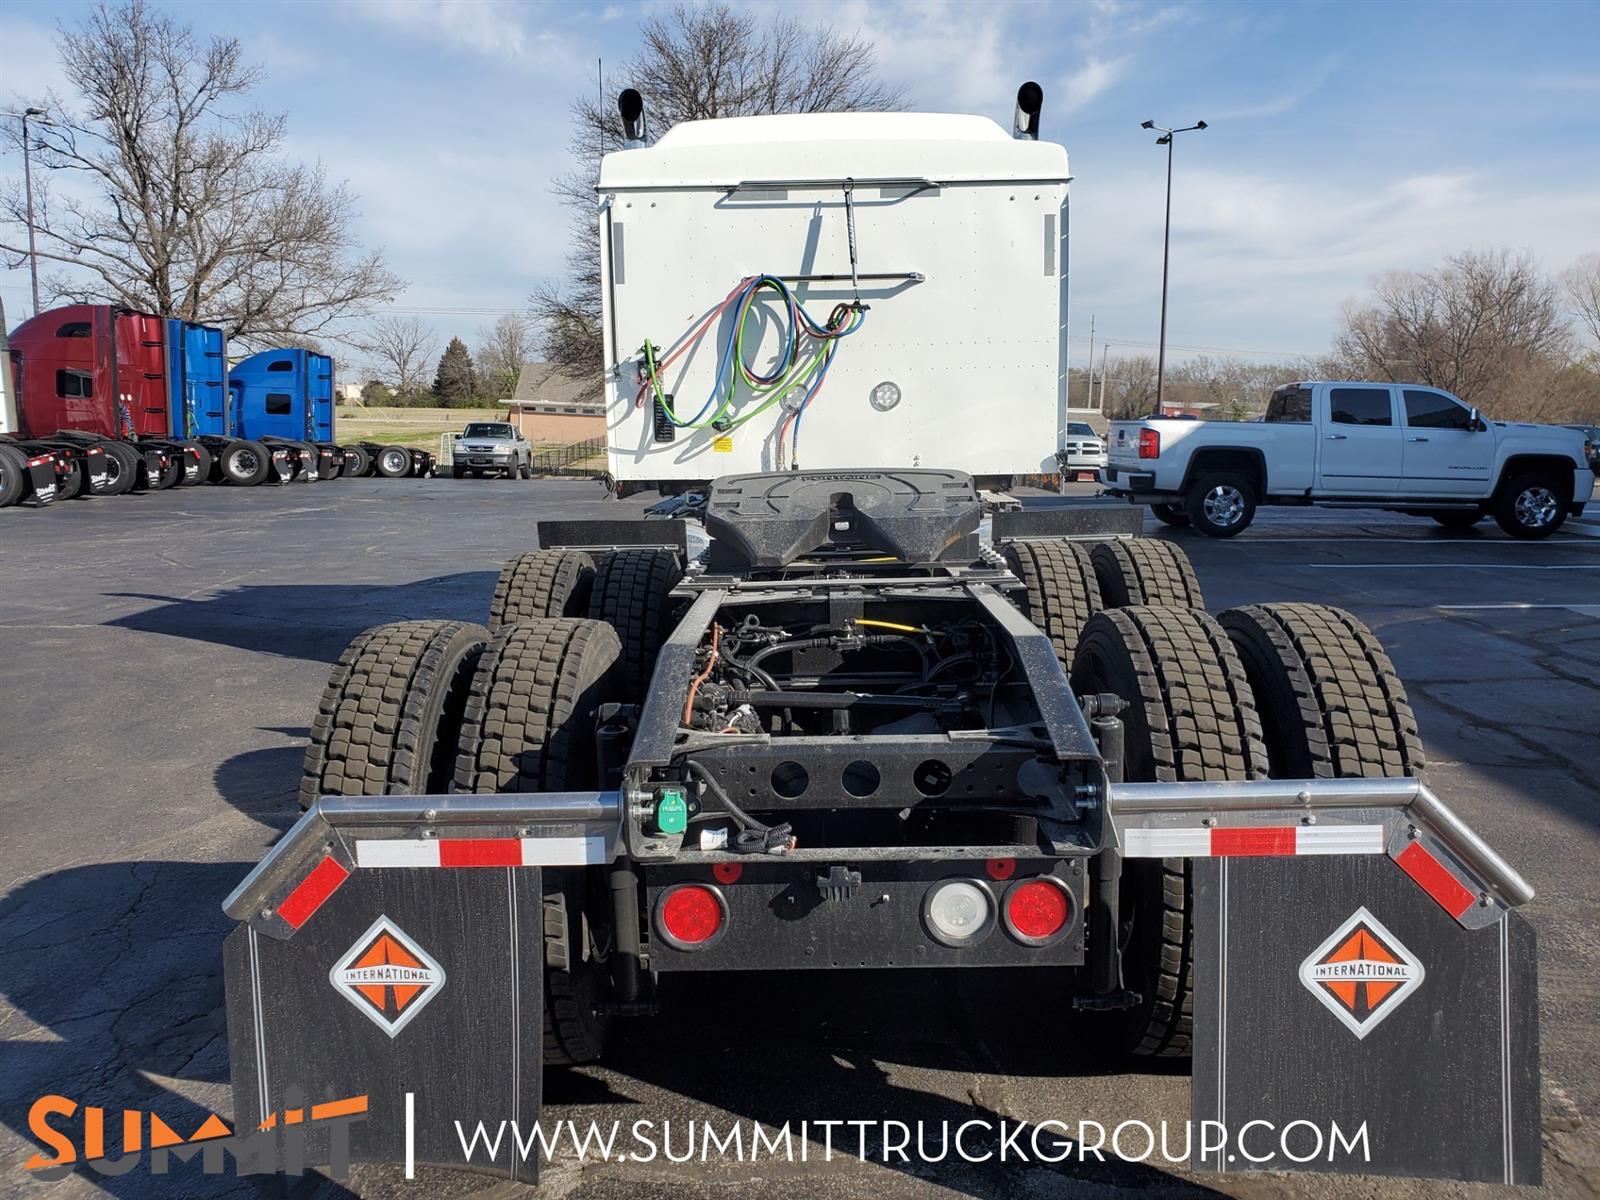 2021 International HX Sleeper Cab 6x4, Tractor #MN341761 - photo 1